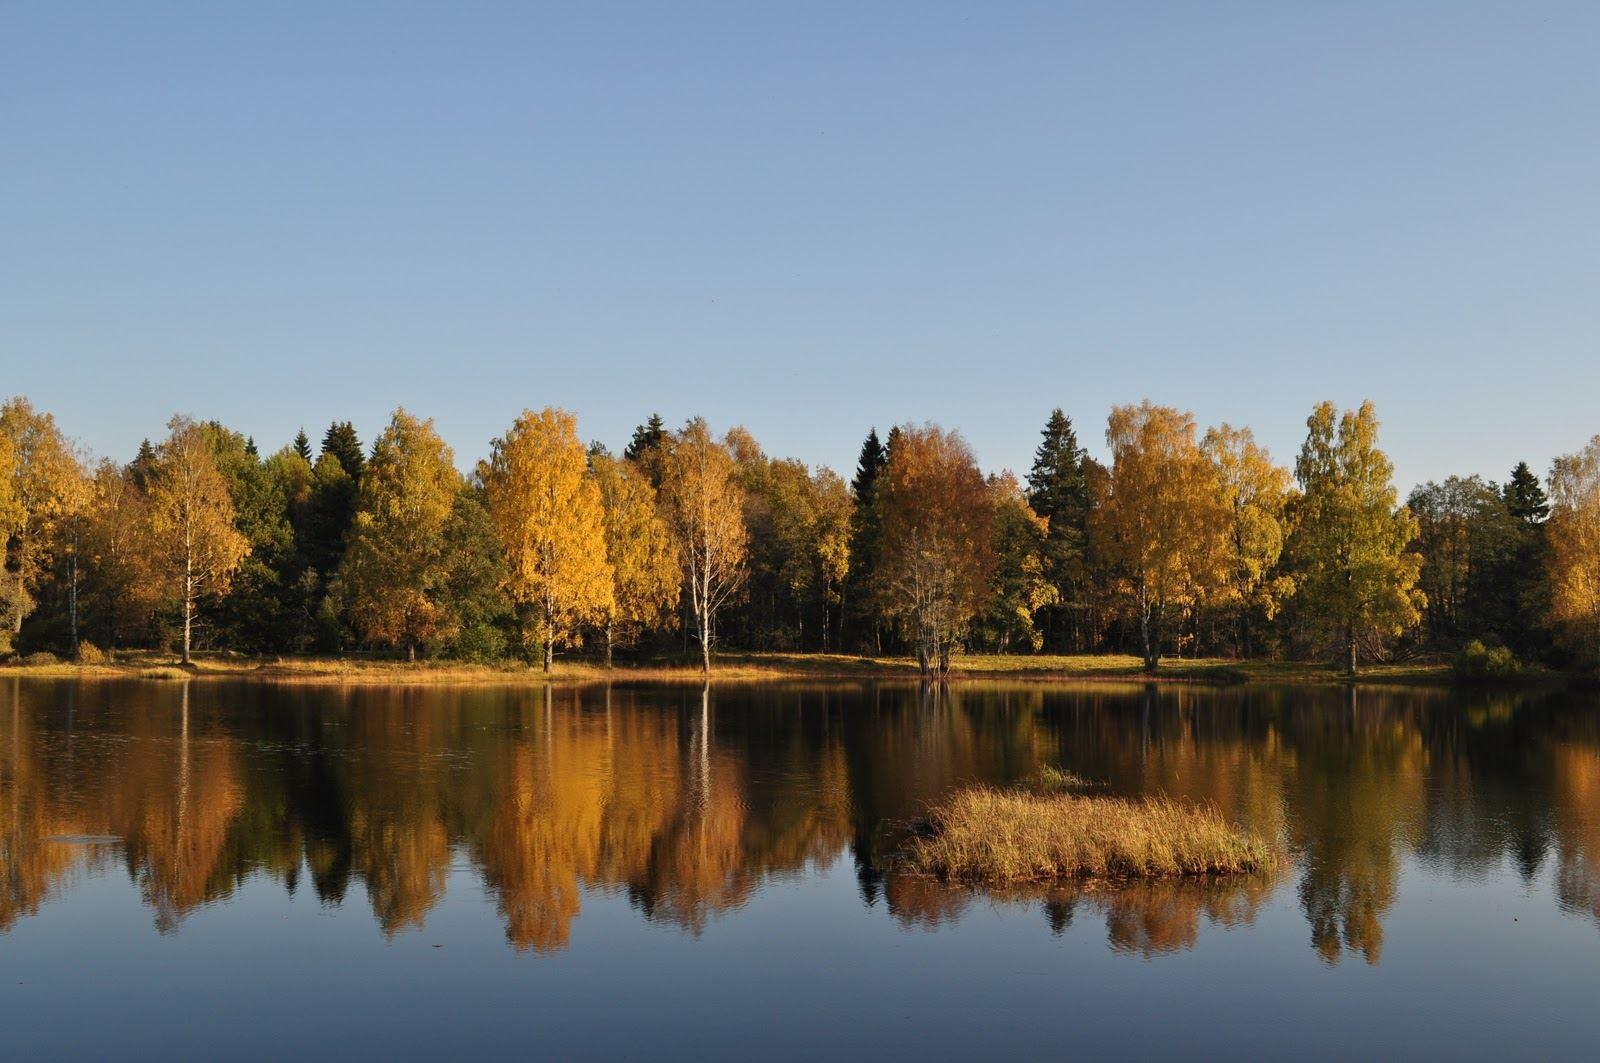 Ettö Nature Reserve